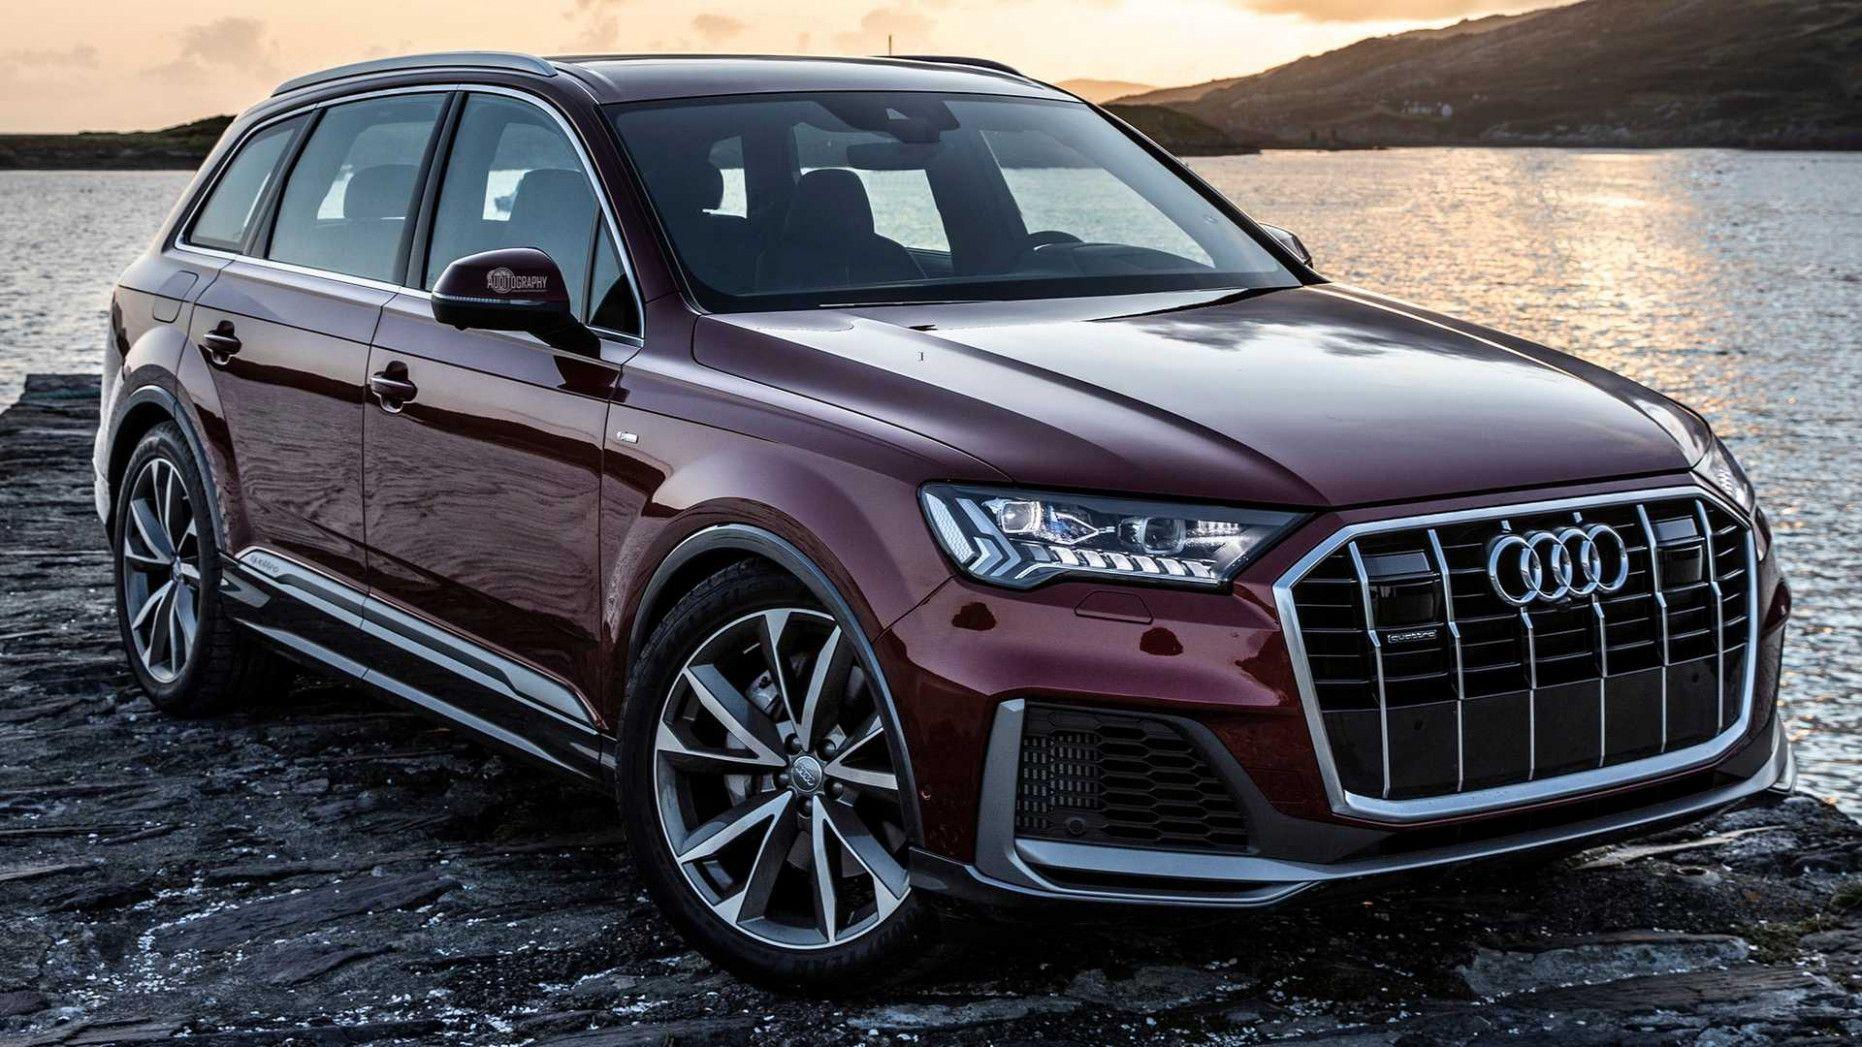 2020 Audi X7 In 2020 Audi Q7 Audi New Audi Q7